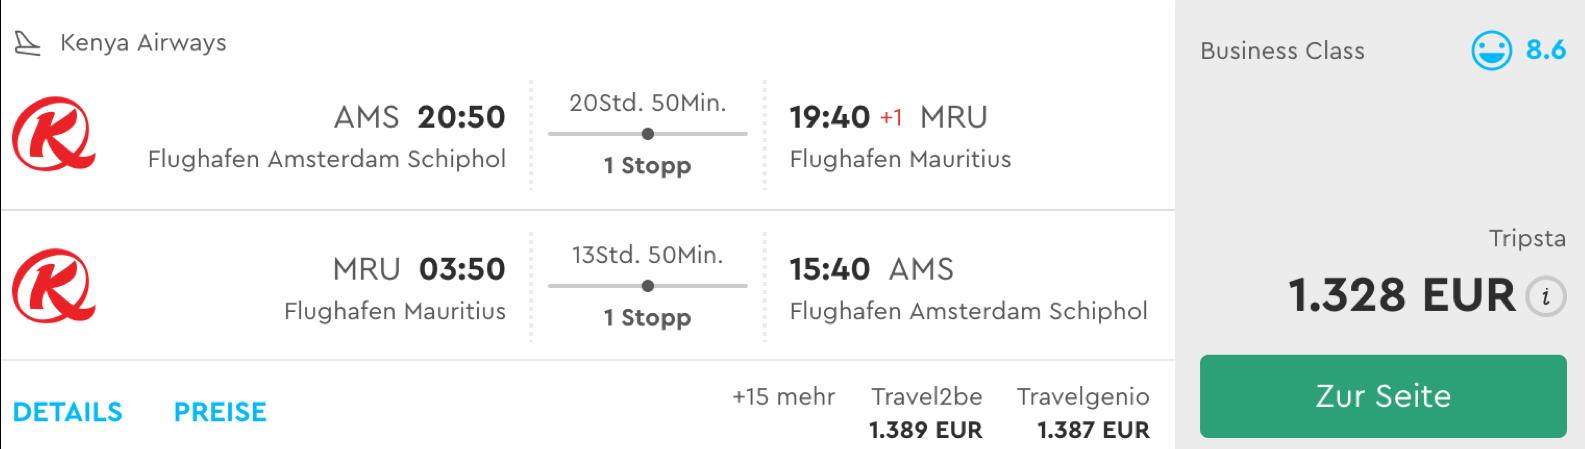 Günstige Business Class Flüge nach Mauritius